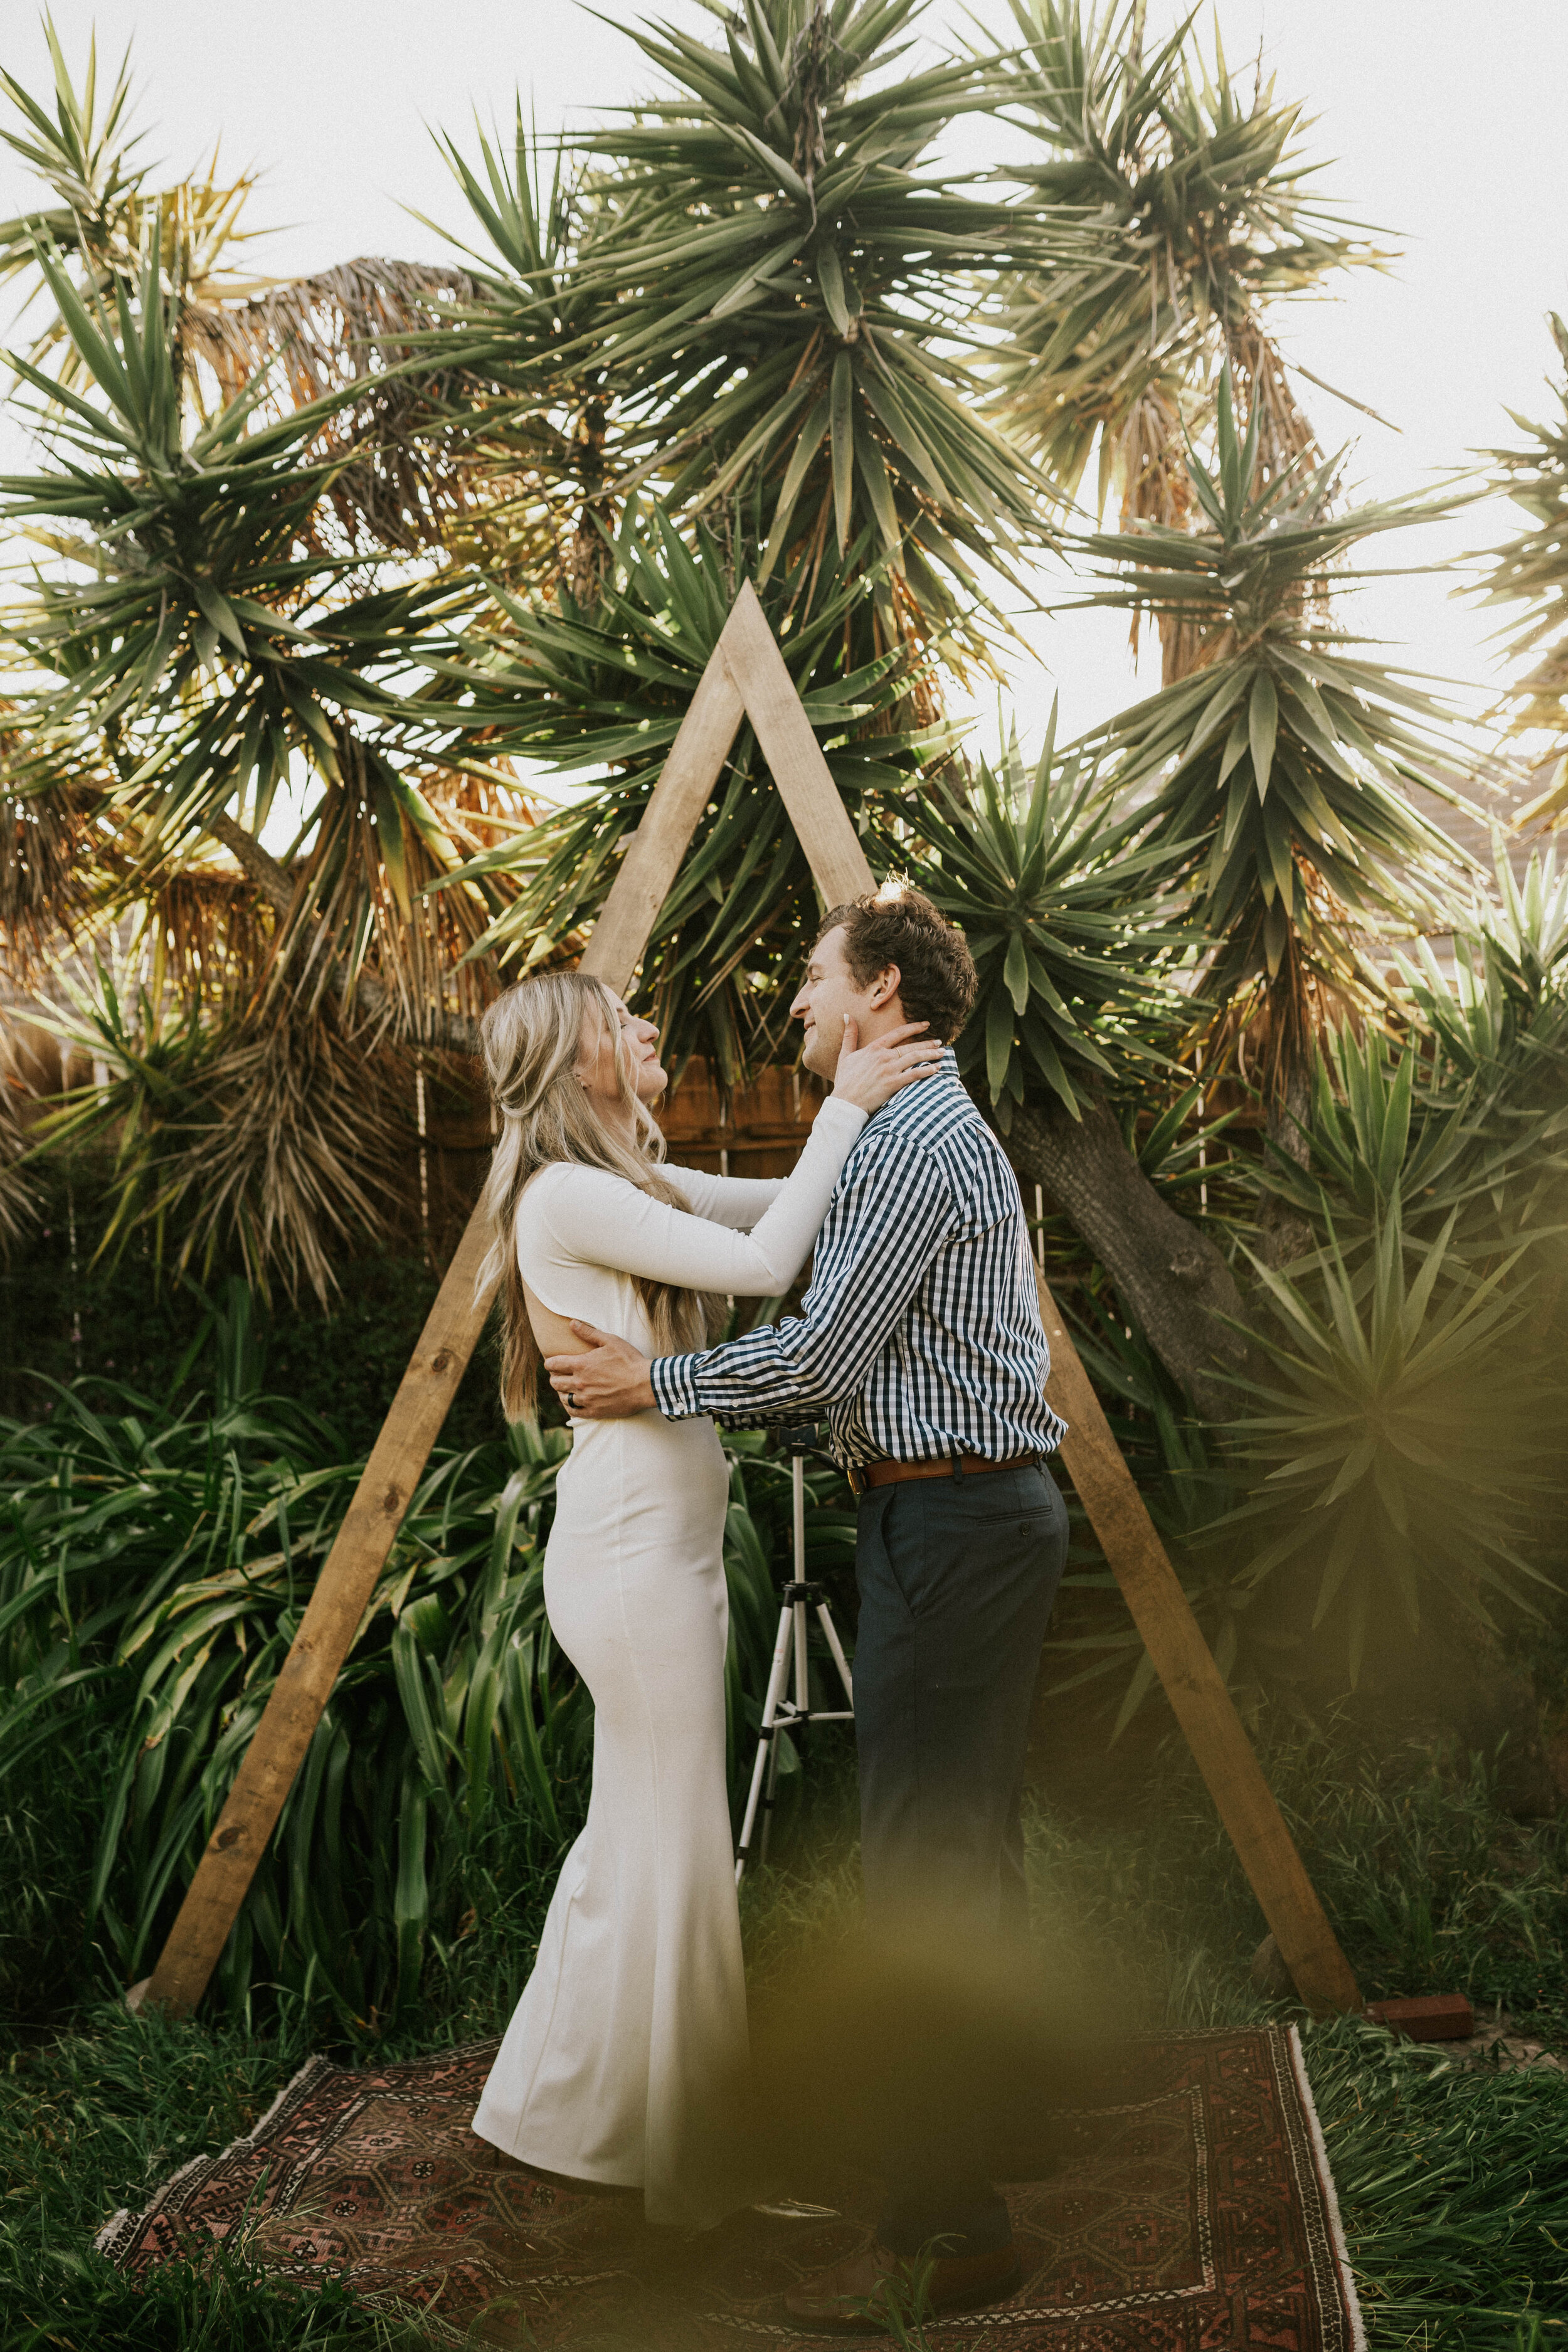 Intimate Tropical Backyard Elopement Top San Diego Adventure Elopement And Wedding Photographer Lauren Turner Photography